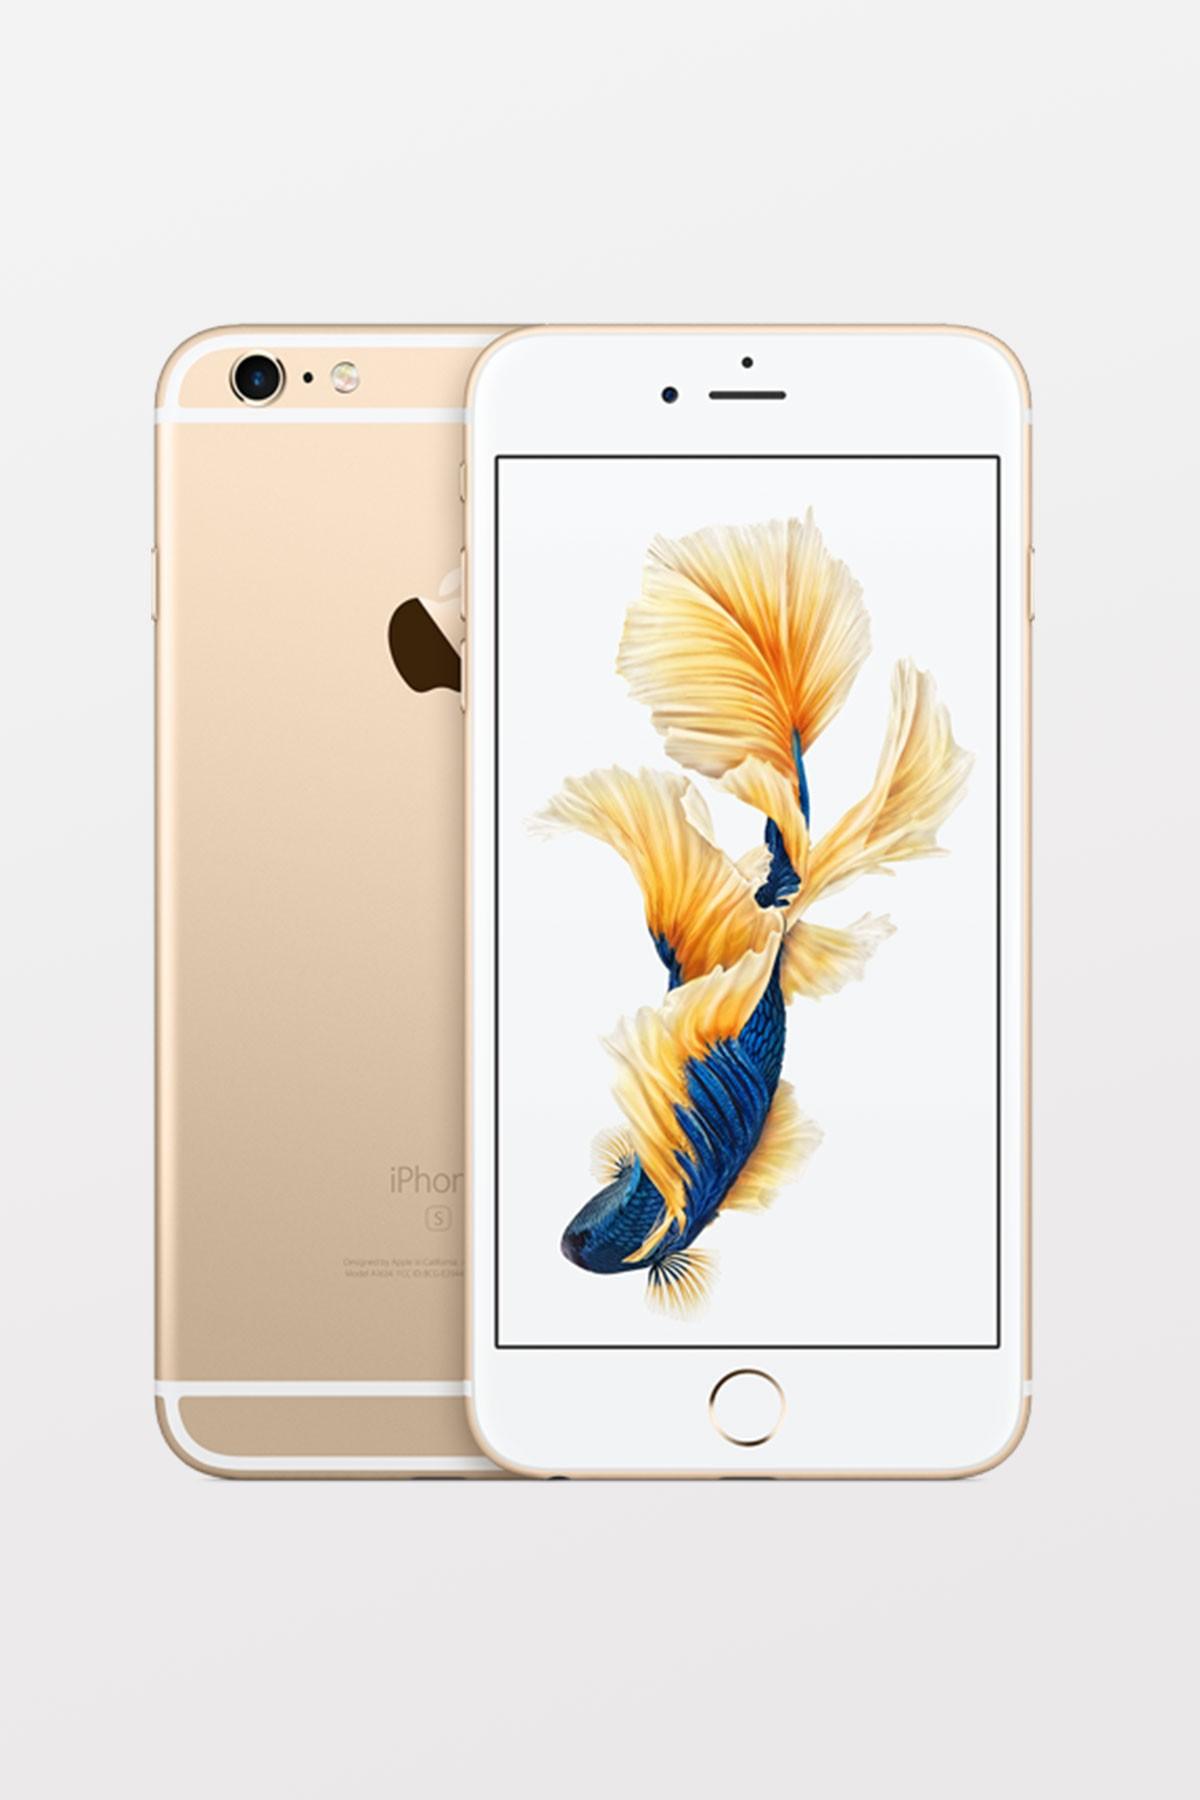 Apple iPhone 6S Plus 128GB - Gold - Refurbished